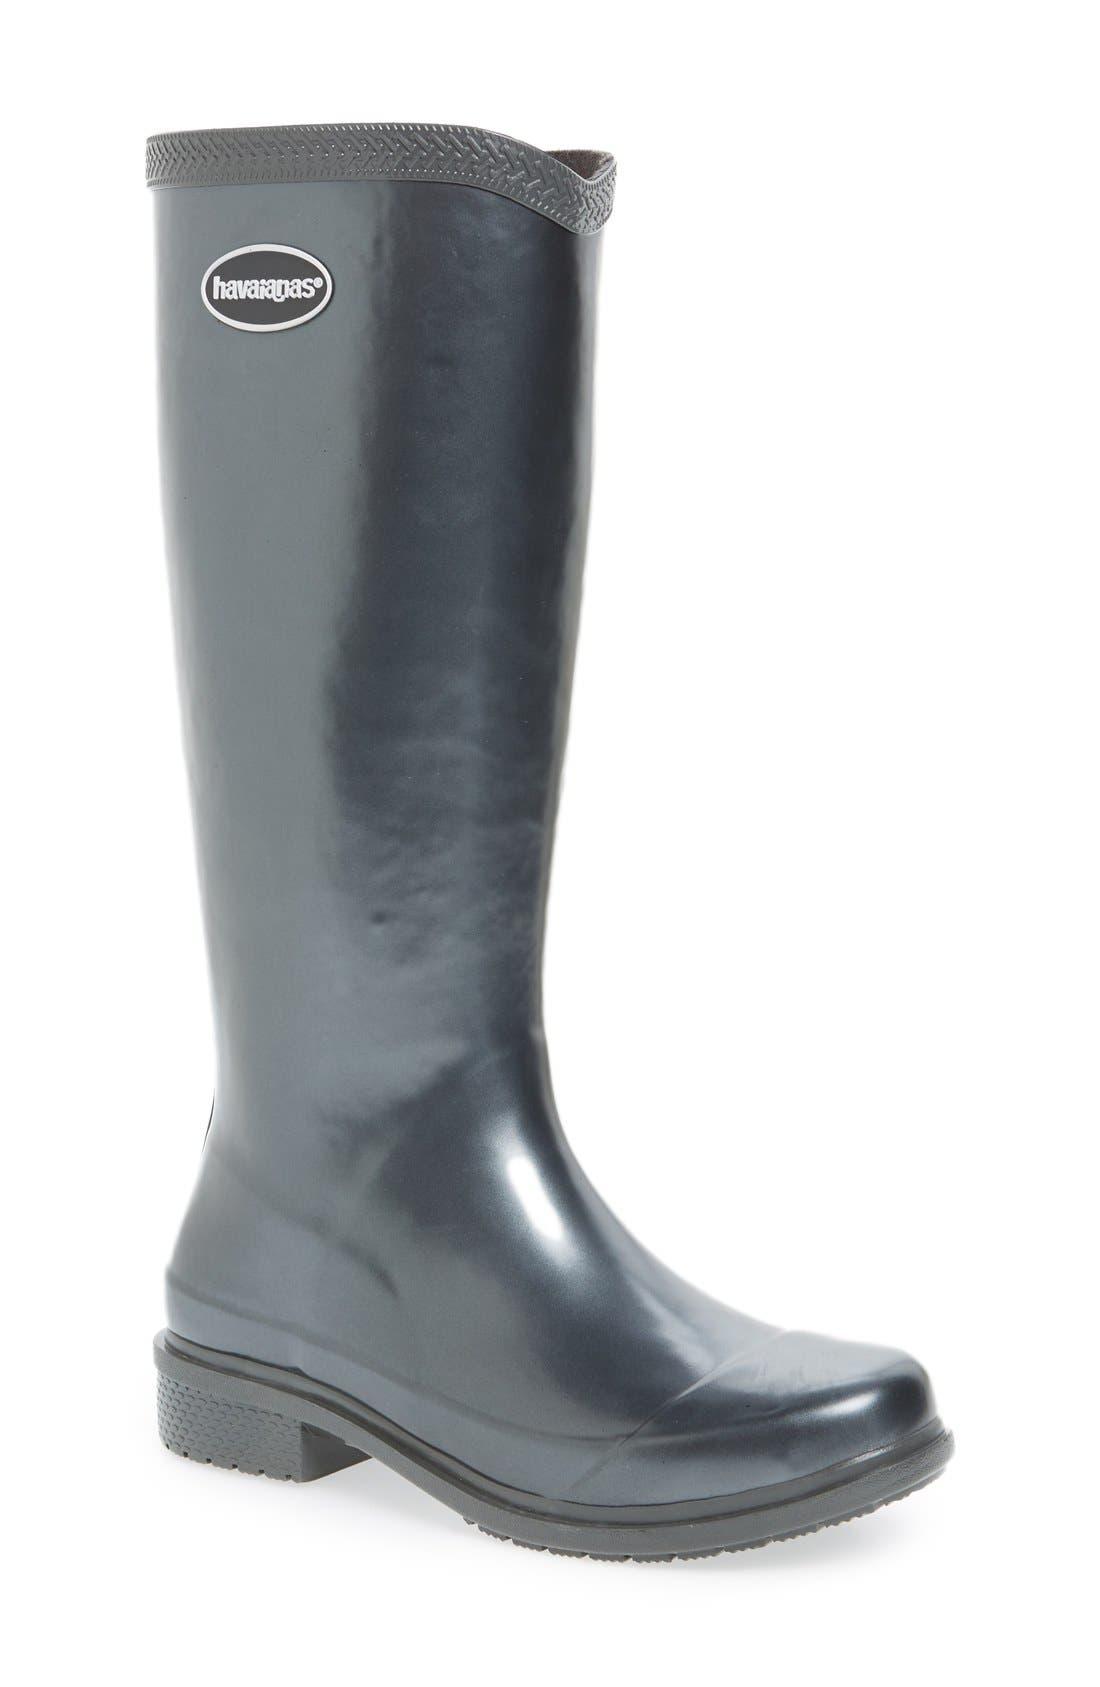 HAVAIANAS Galochas Hi Metallic Waterproof Rain Boot